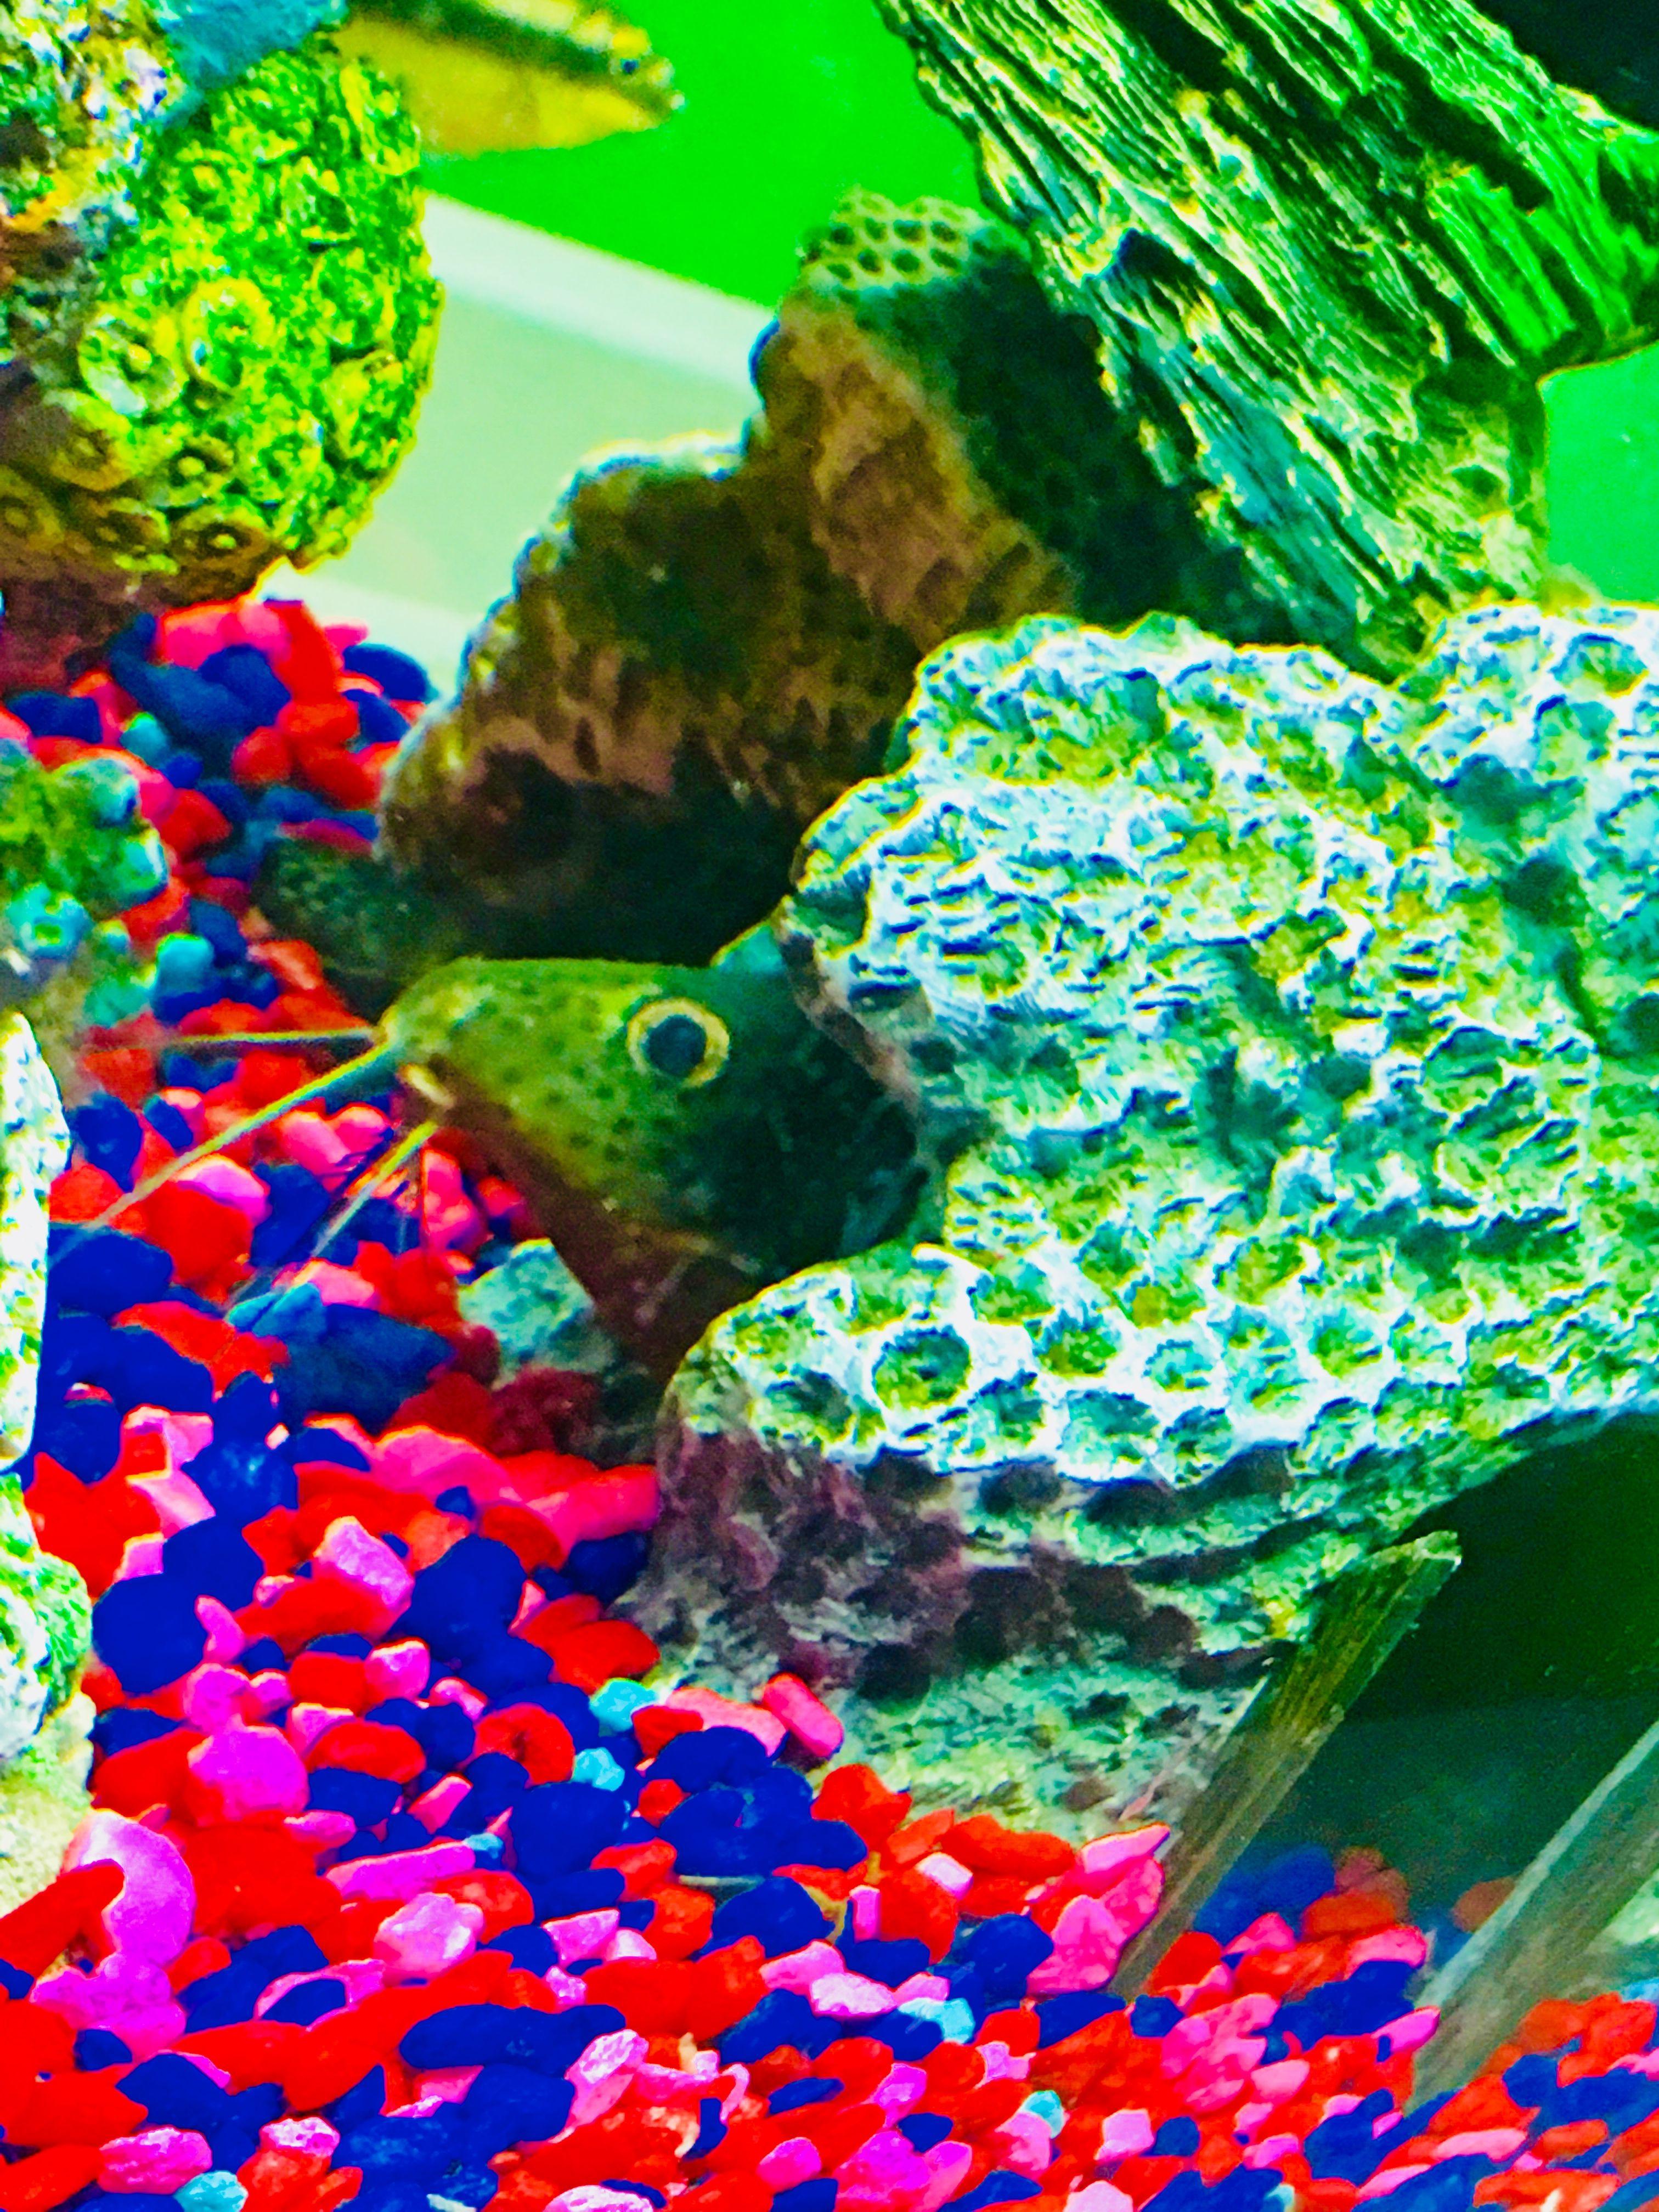 Synodontis featherfin squeaker catfish Jack Dempsey tank